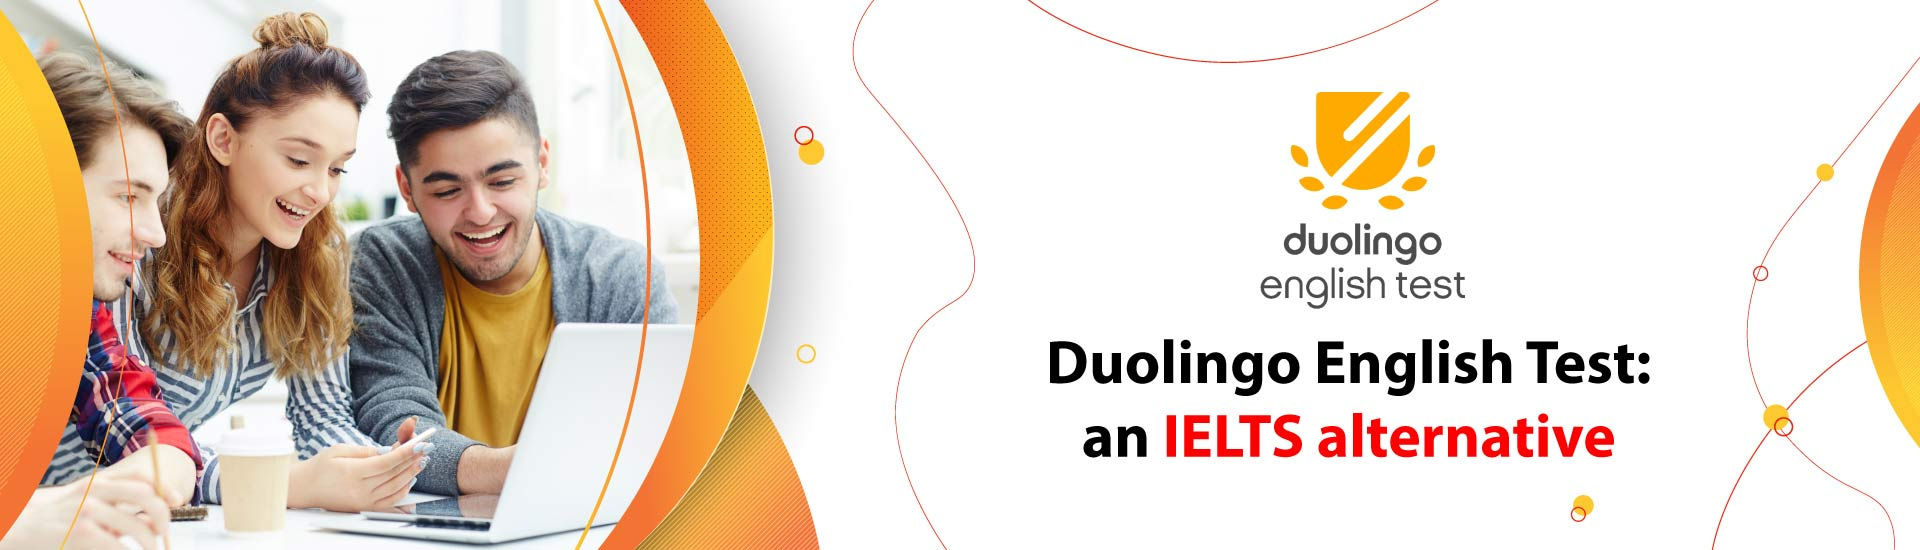 Duolingo English Test: an IELTS alternative